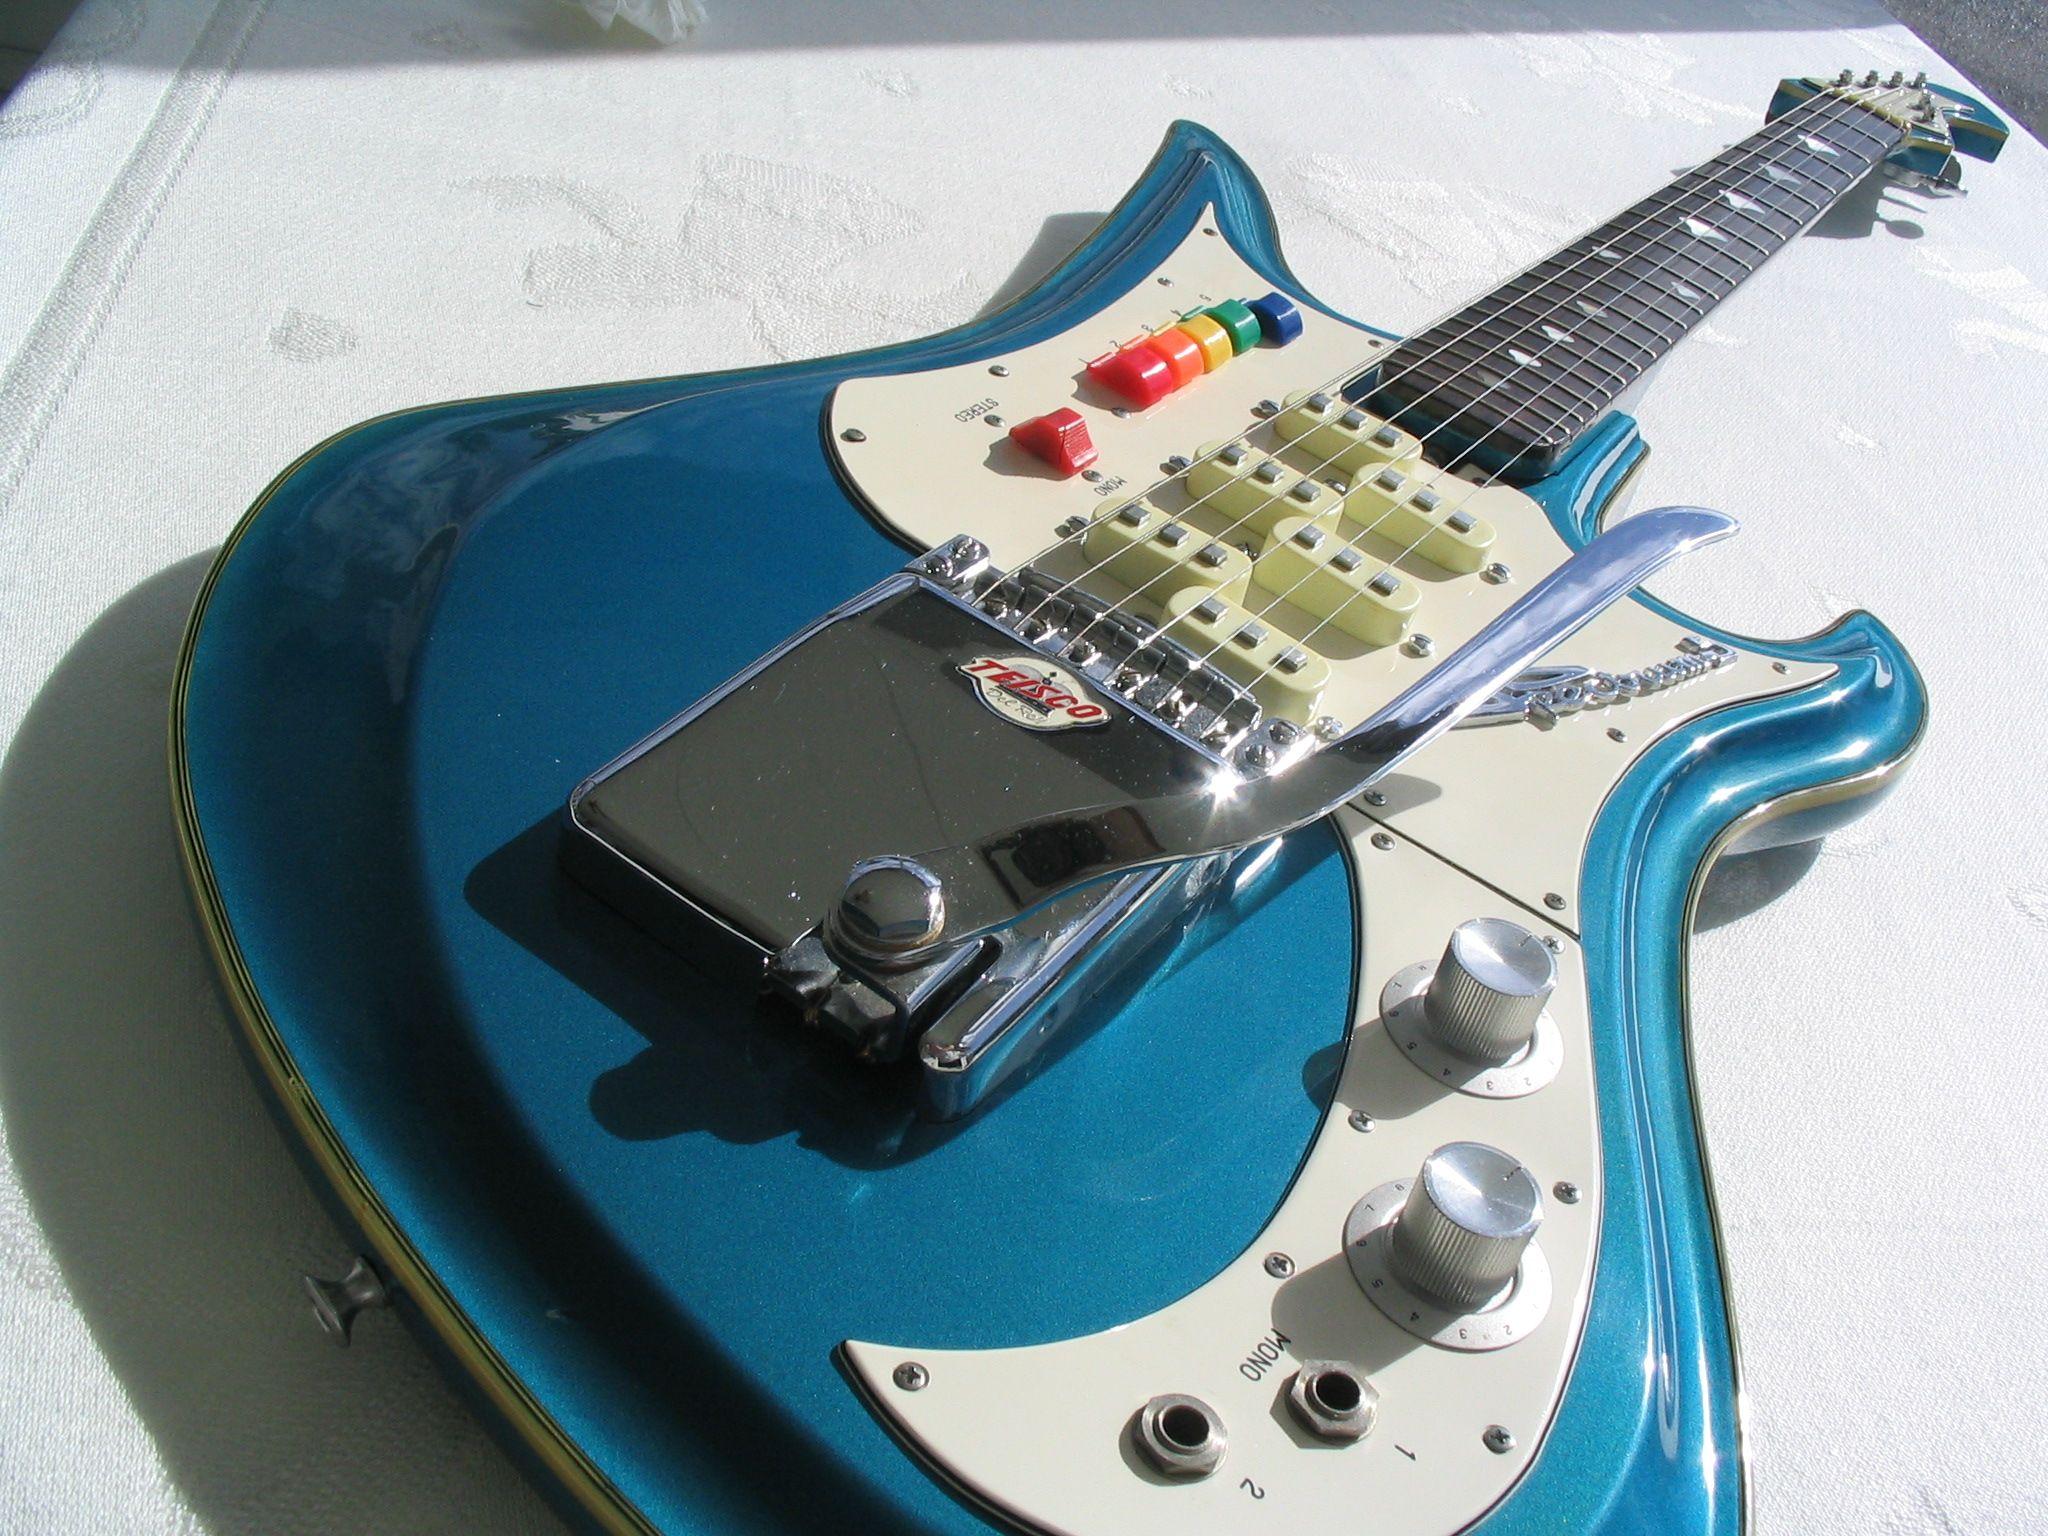 28 wiring diagram teisco guitar cadillac sts v engine diagram gfs 38 best mosrite images on pinterest guitars vintage guitars and cb2d6839eff7b8f604def4d25bb3742b mosrite 28 wiring diagram teisco guitar cheapraybanclubmaster Images